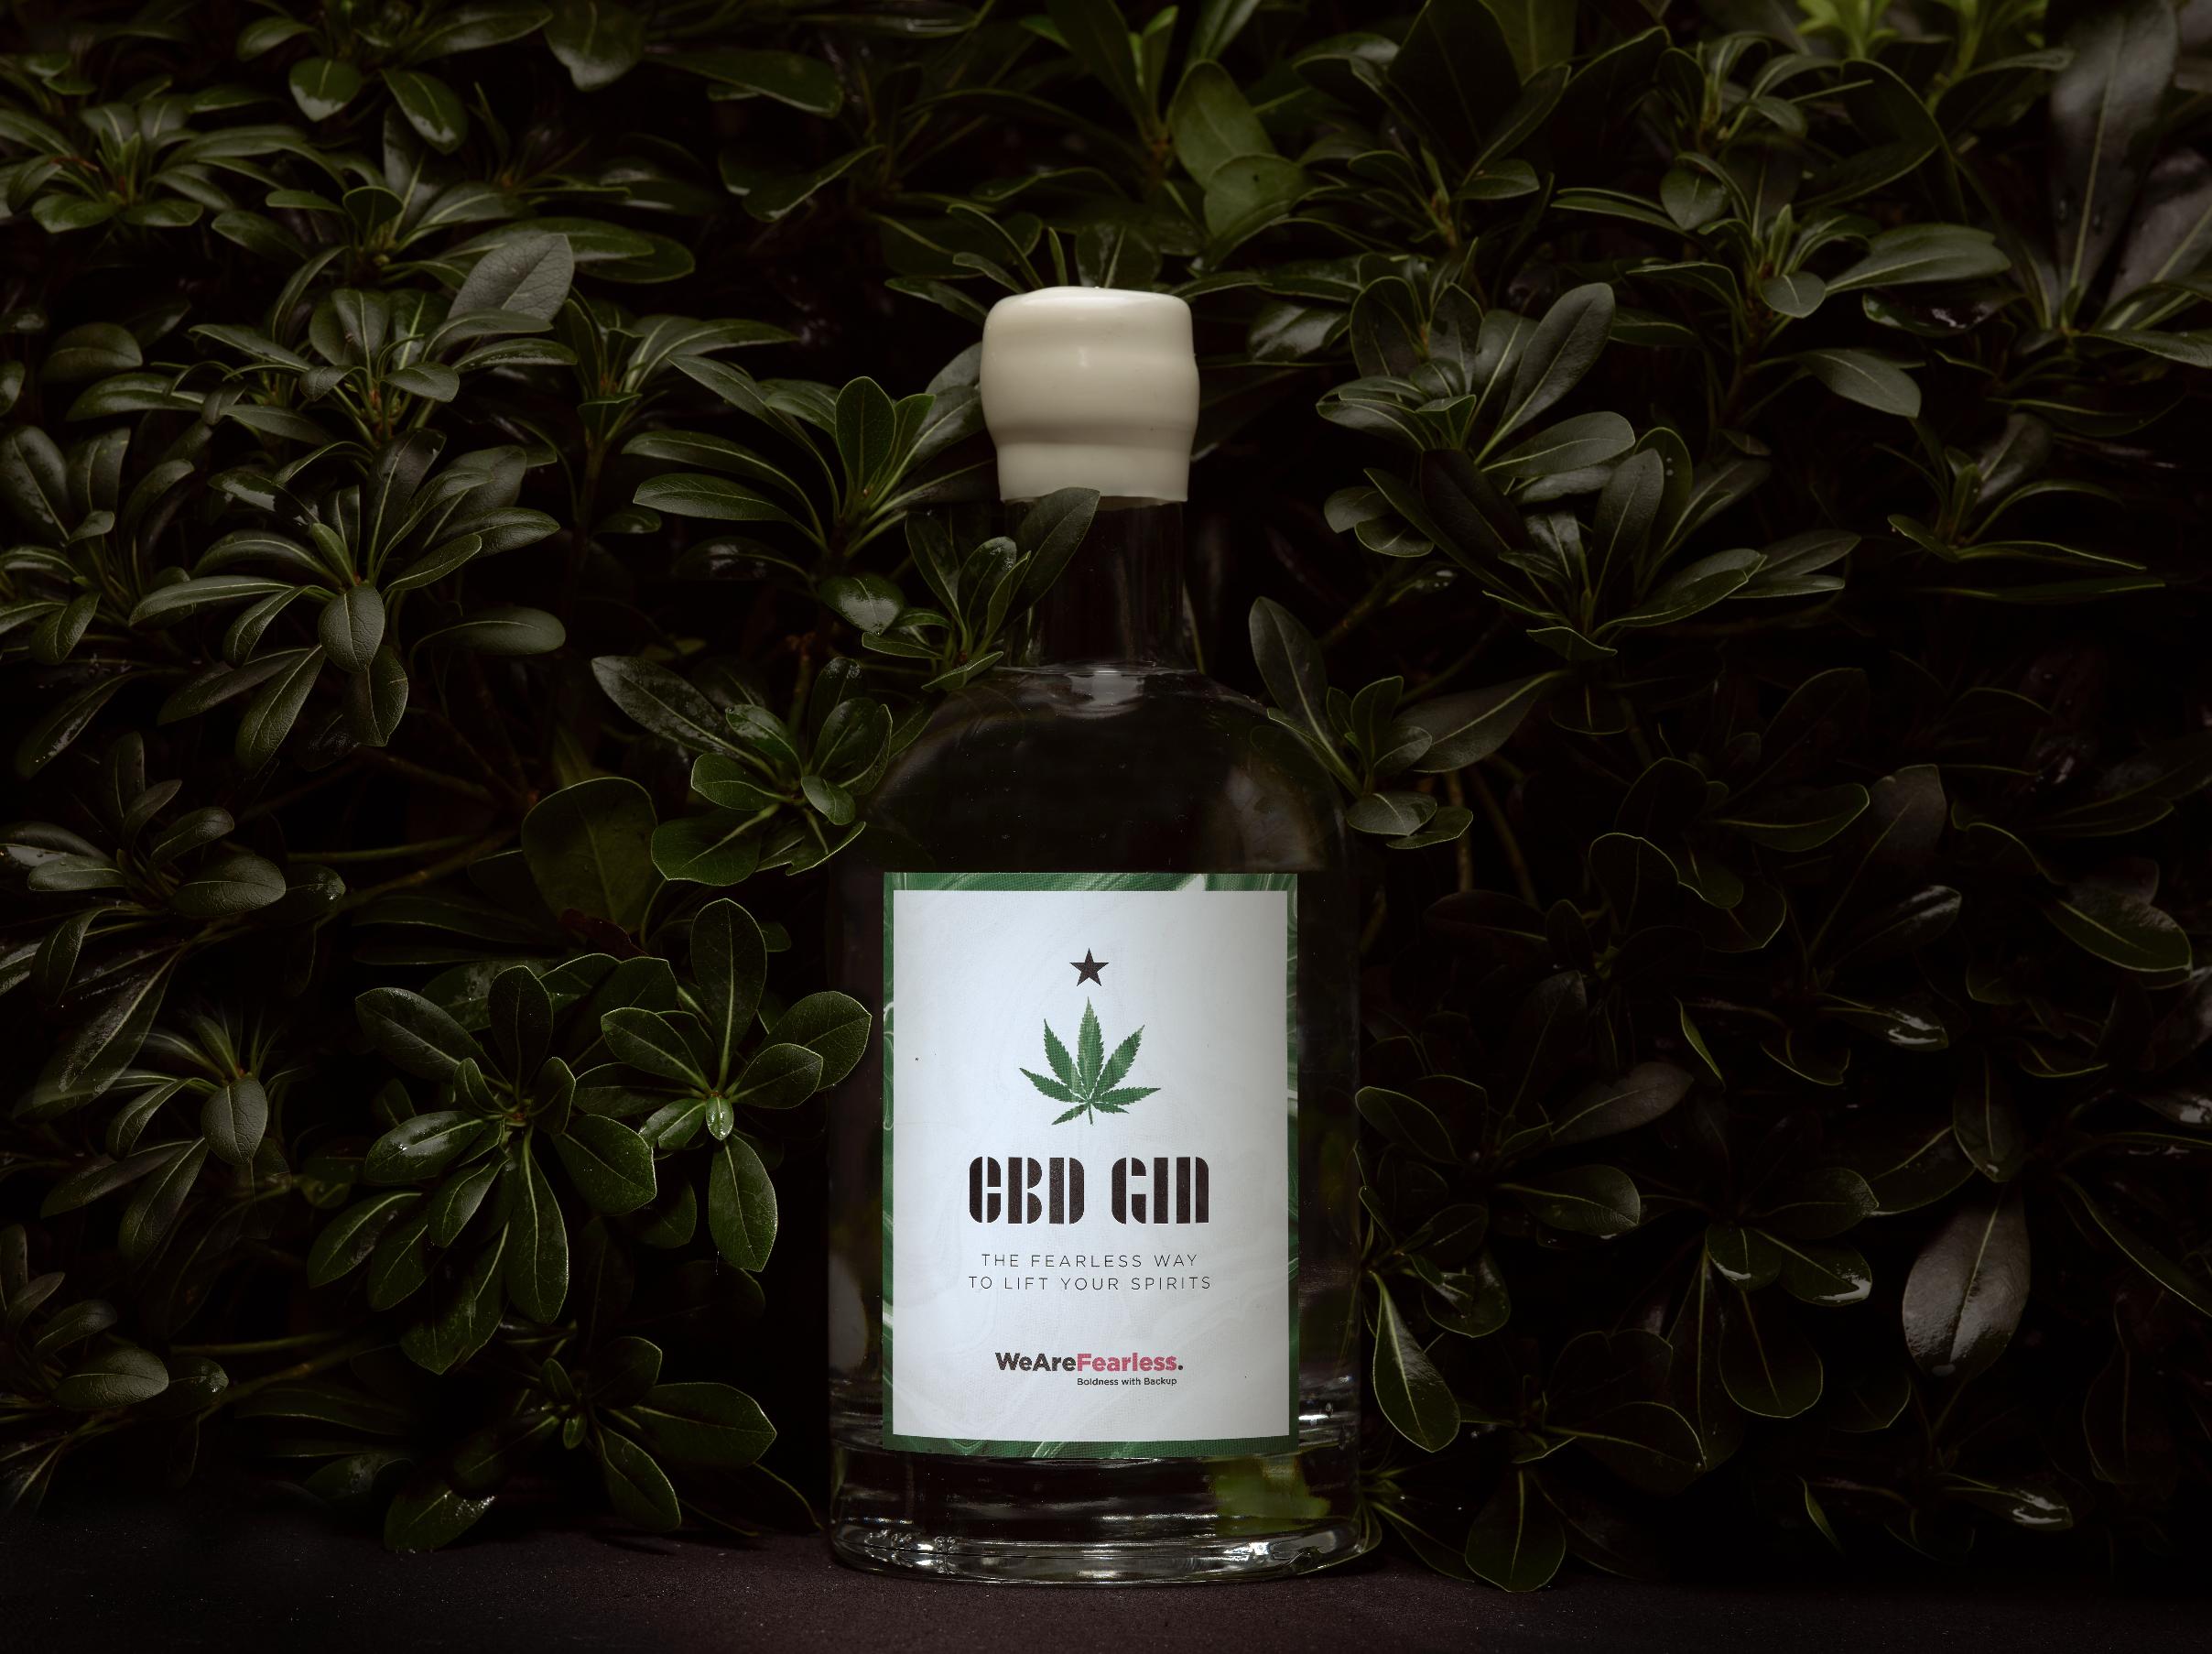 WeAreFearless: agency created CBD gin